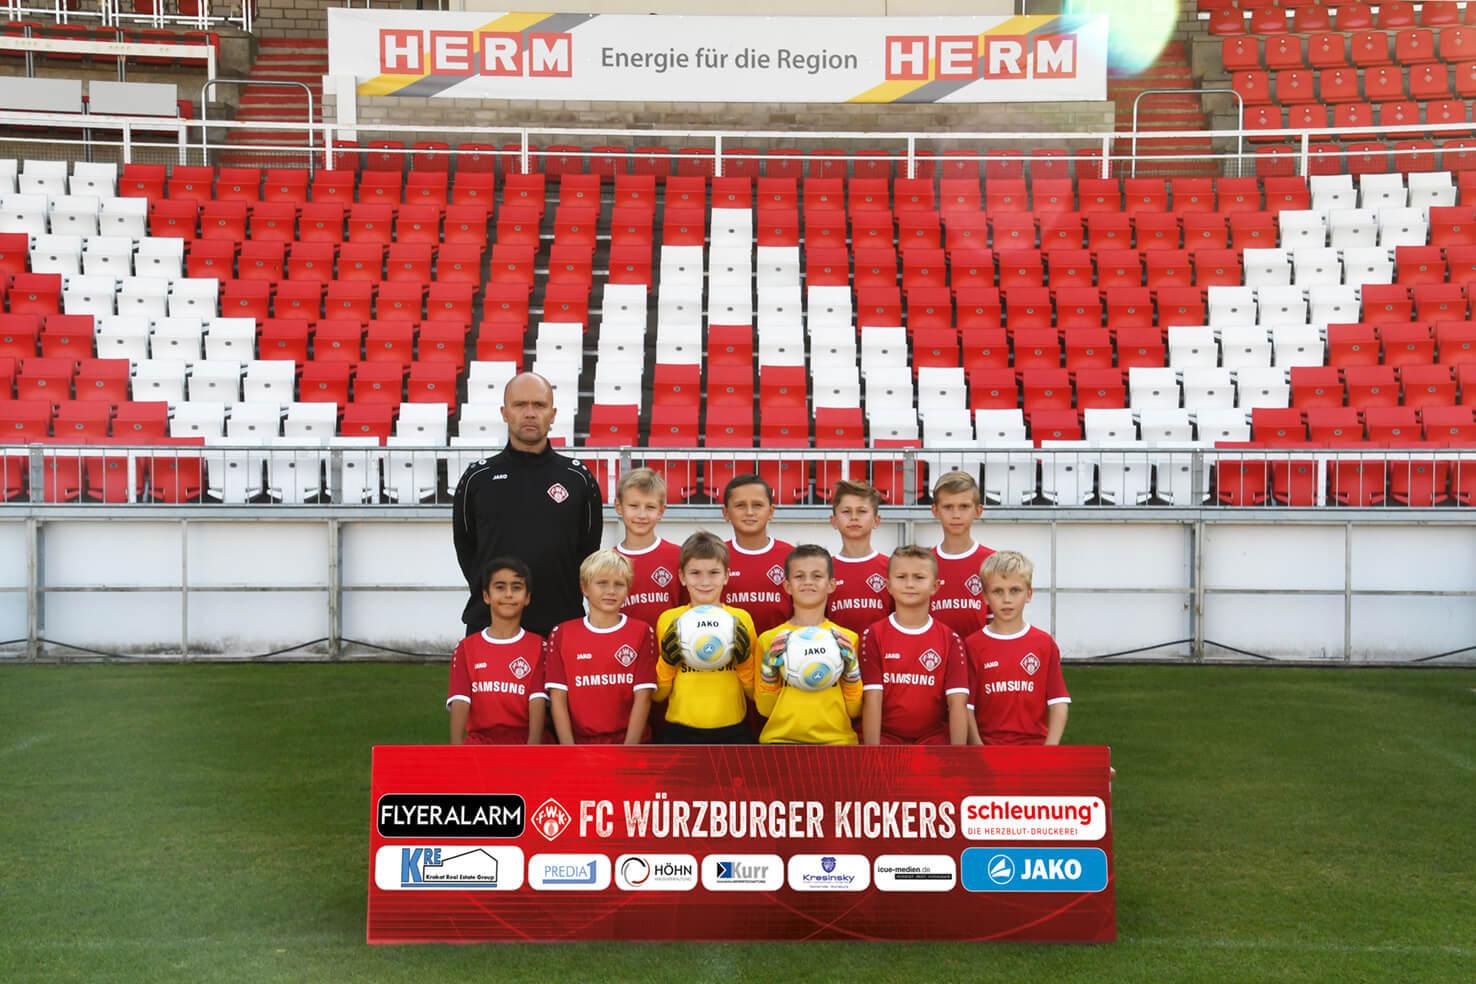 U10 Würzburger Kickers